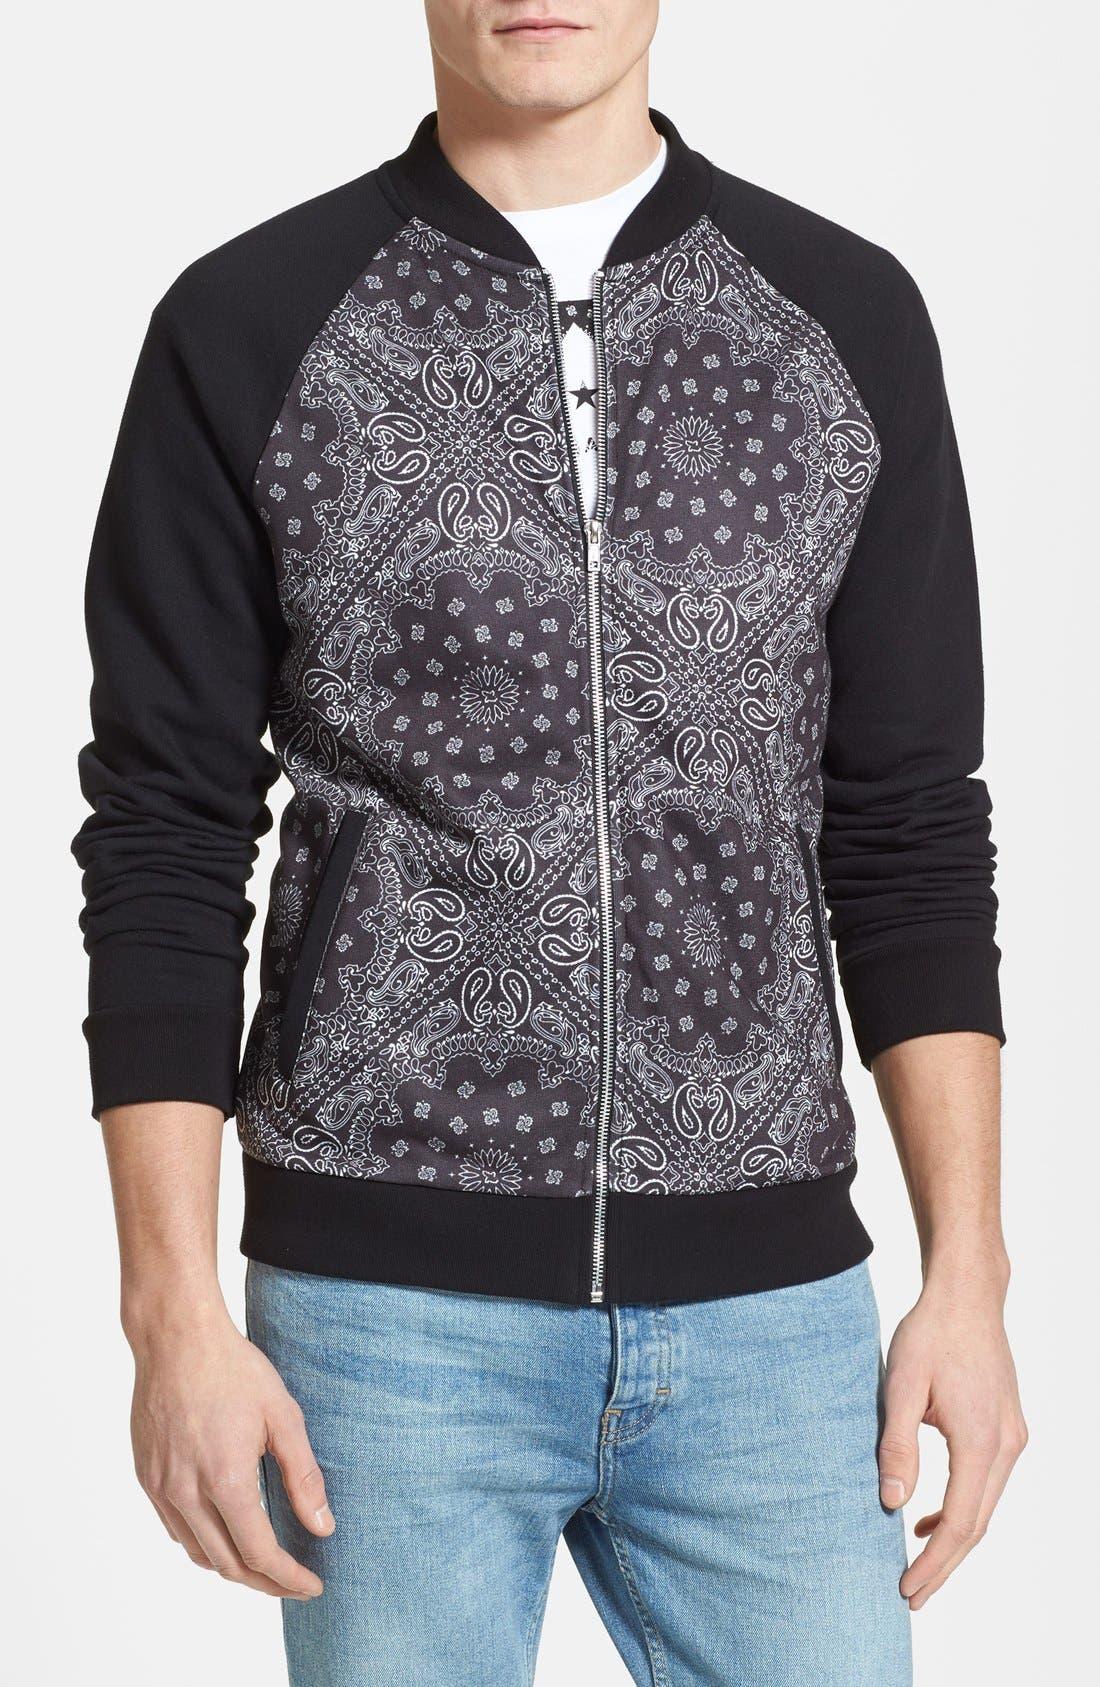 Alternate Image 1 Selected - Topman Bandana Print Jersey Zip Sweatshirt